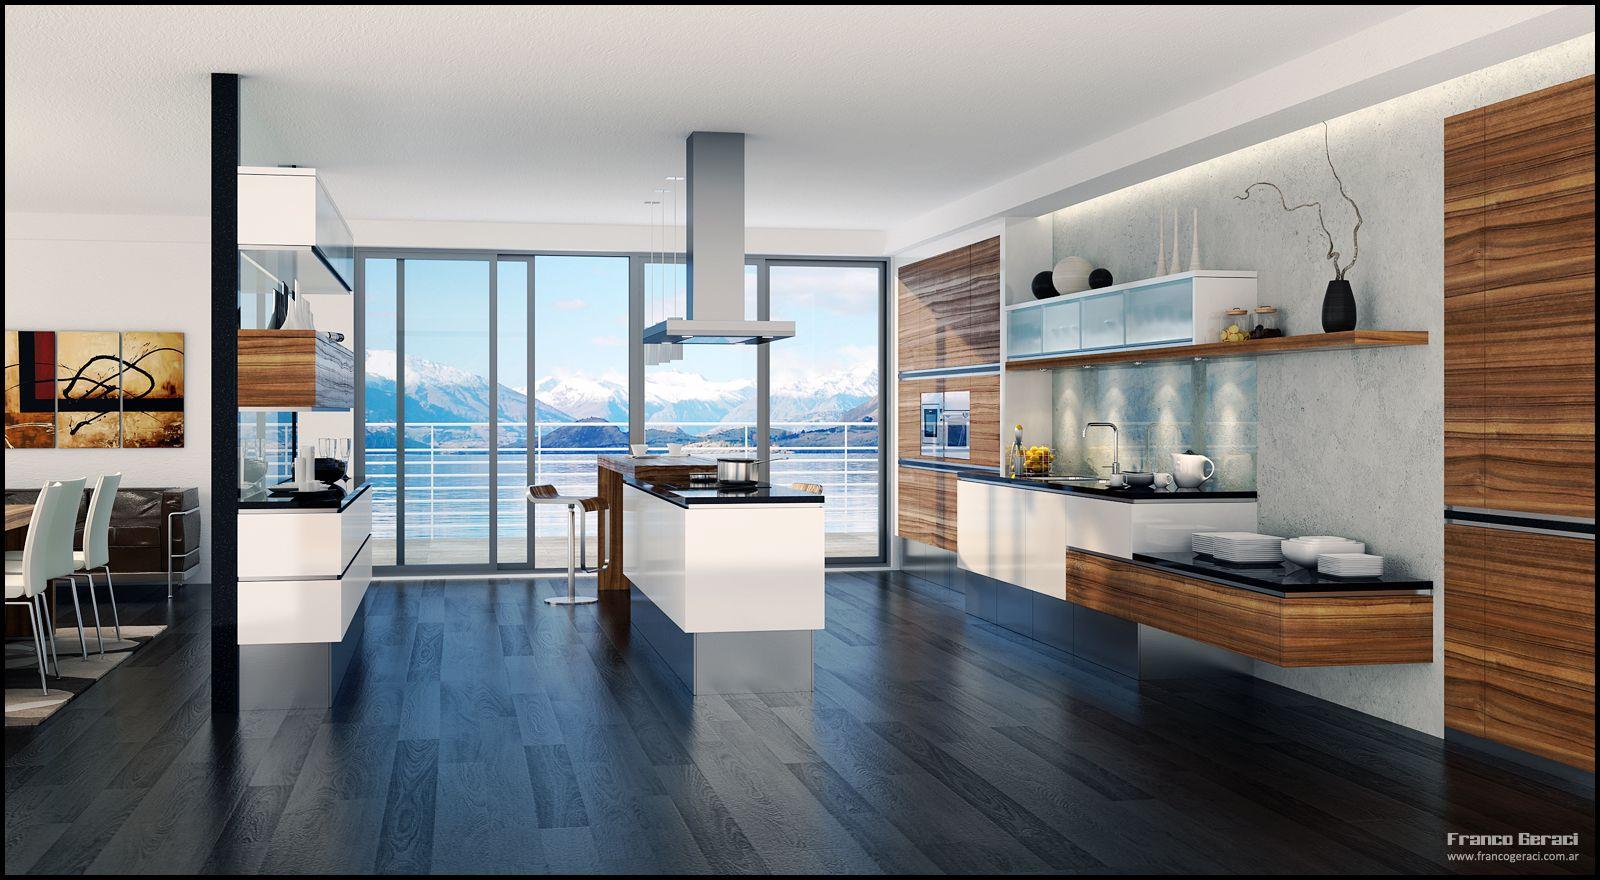 1000+ images about Modern Kitchen Interior Design on Pinterest - ^